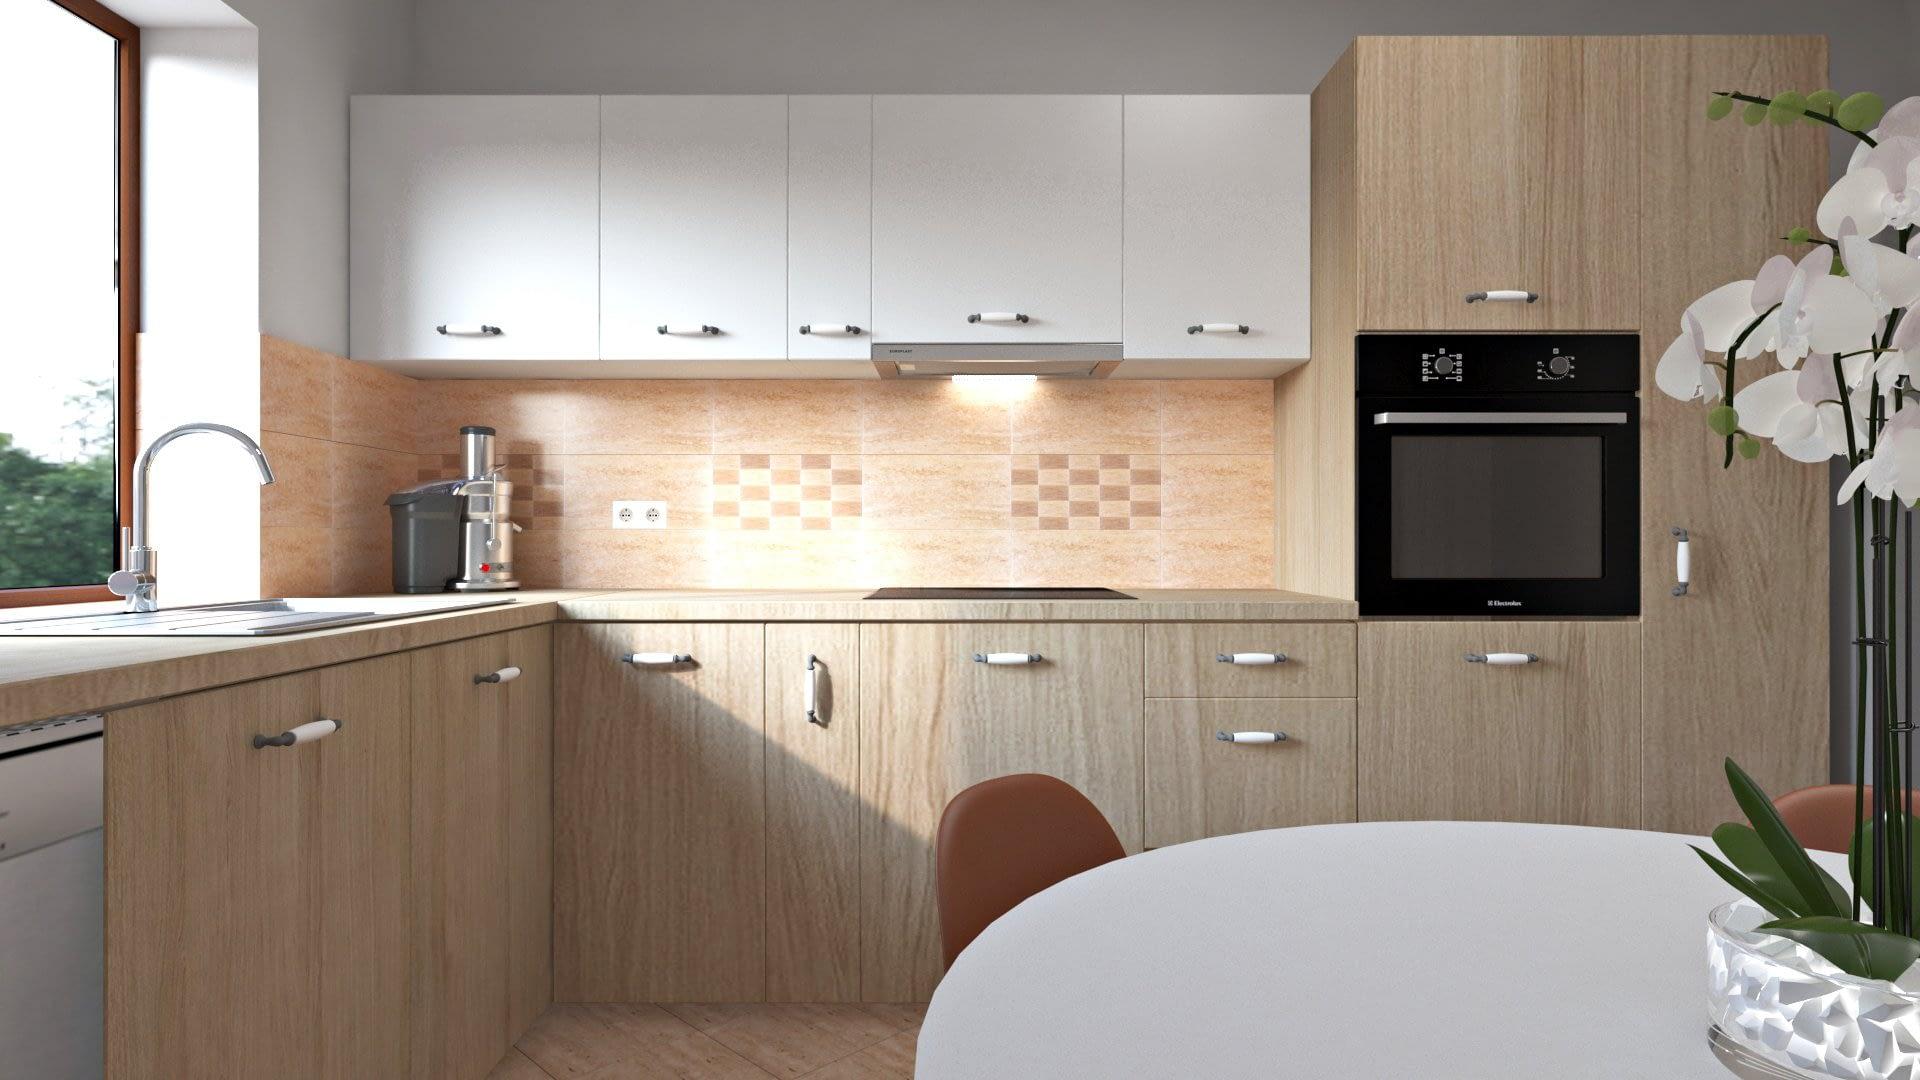 Design Interior Bucatararie | Travertin 02